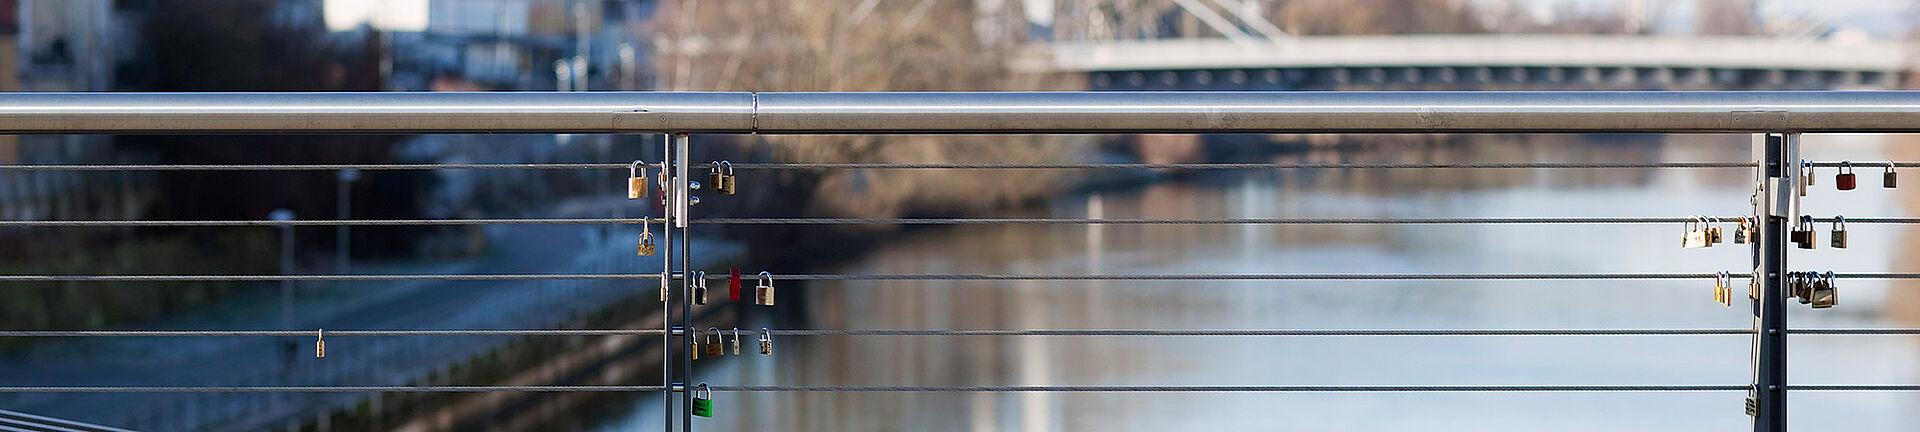 Kettenbrücke Bamberg I-SYS Edelstahl-Seilsysteme Geländerfüllung